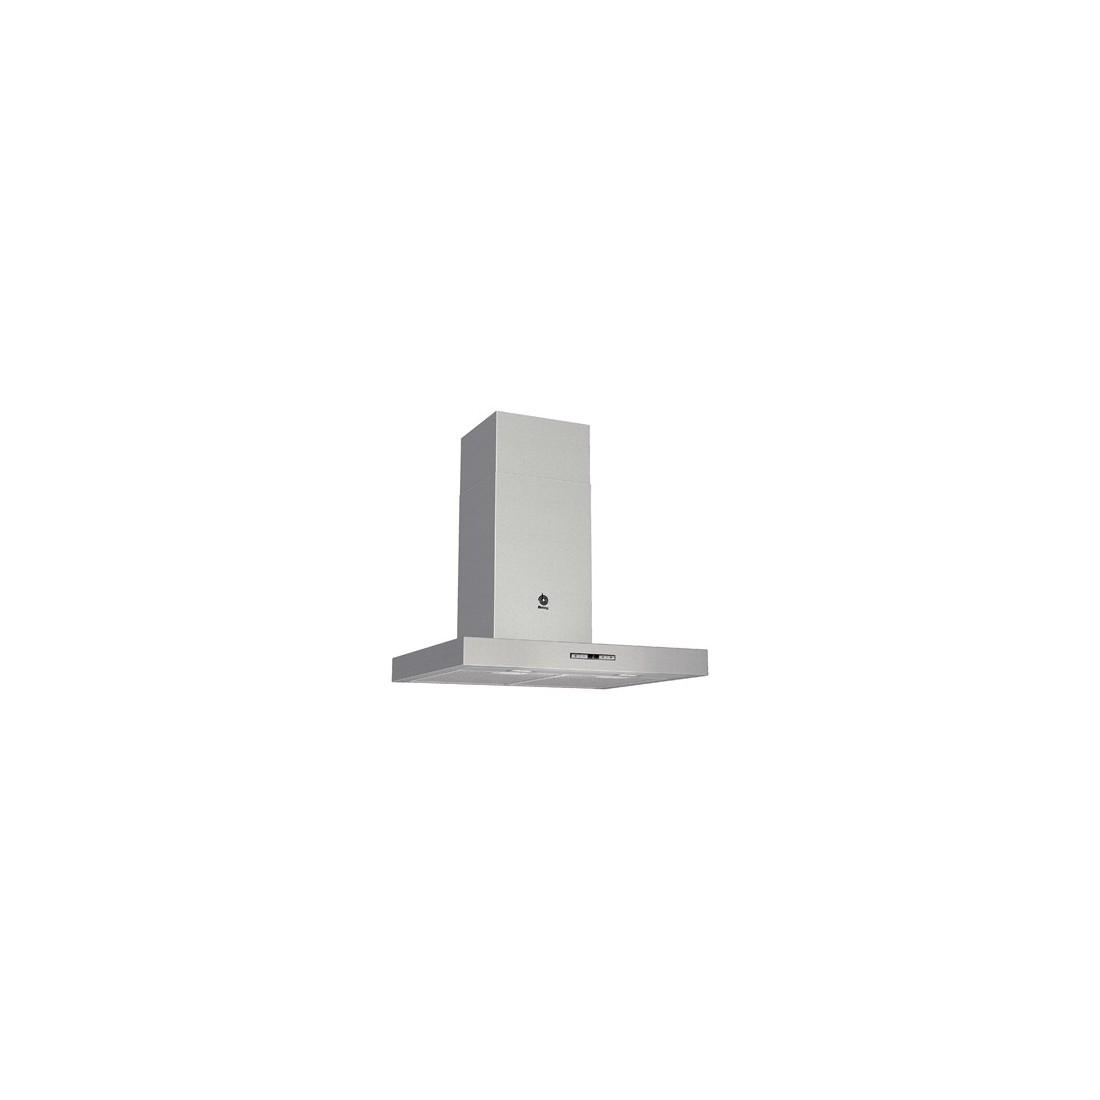 Campana Decorativa - Balay 3BC866XM, Acero Inoxidable, T-Invertida